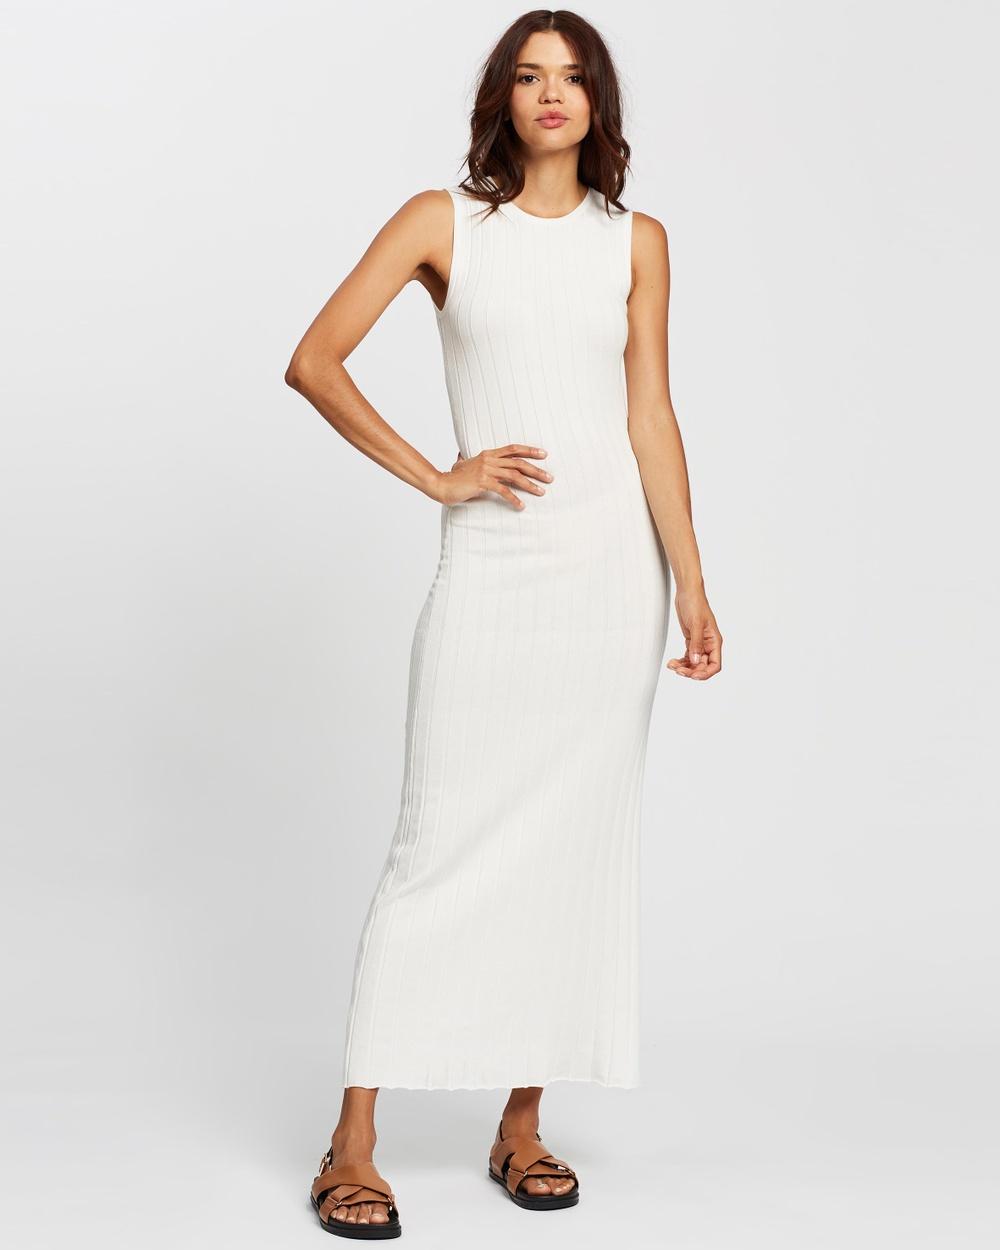 AERE Sunray Pleat Dress Bodycon Dresses Ivory Australia